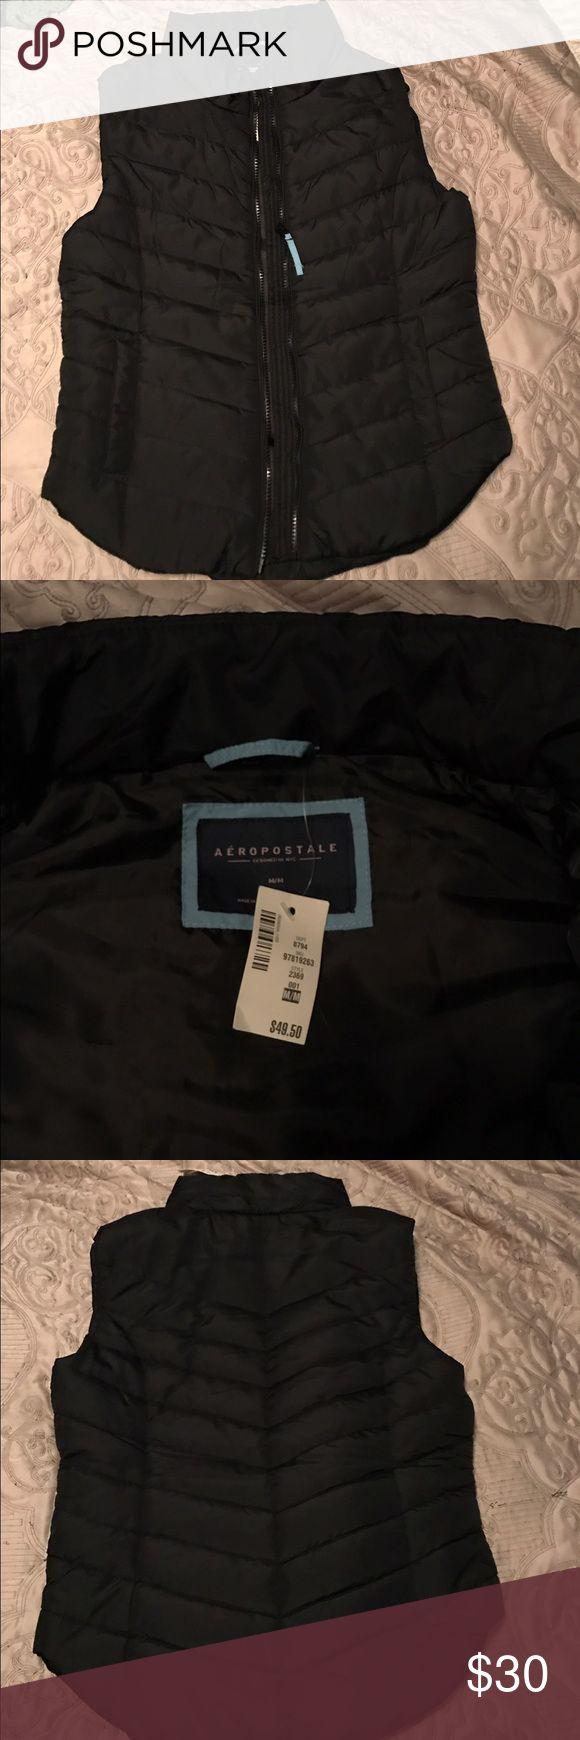 Black zip up light puffer vest Brand new black zip up puffer vest. Lightweight, never worn. Excellent condition Aeropostale Jackets & Coats Vests